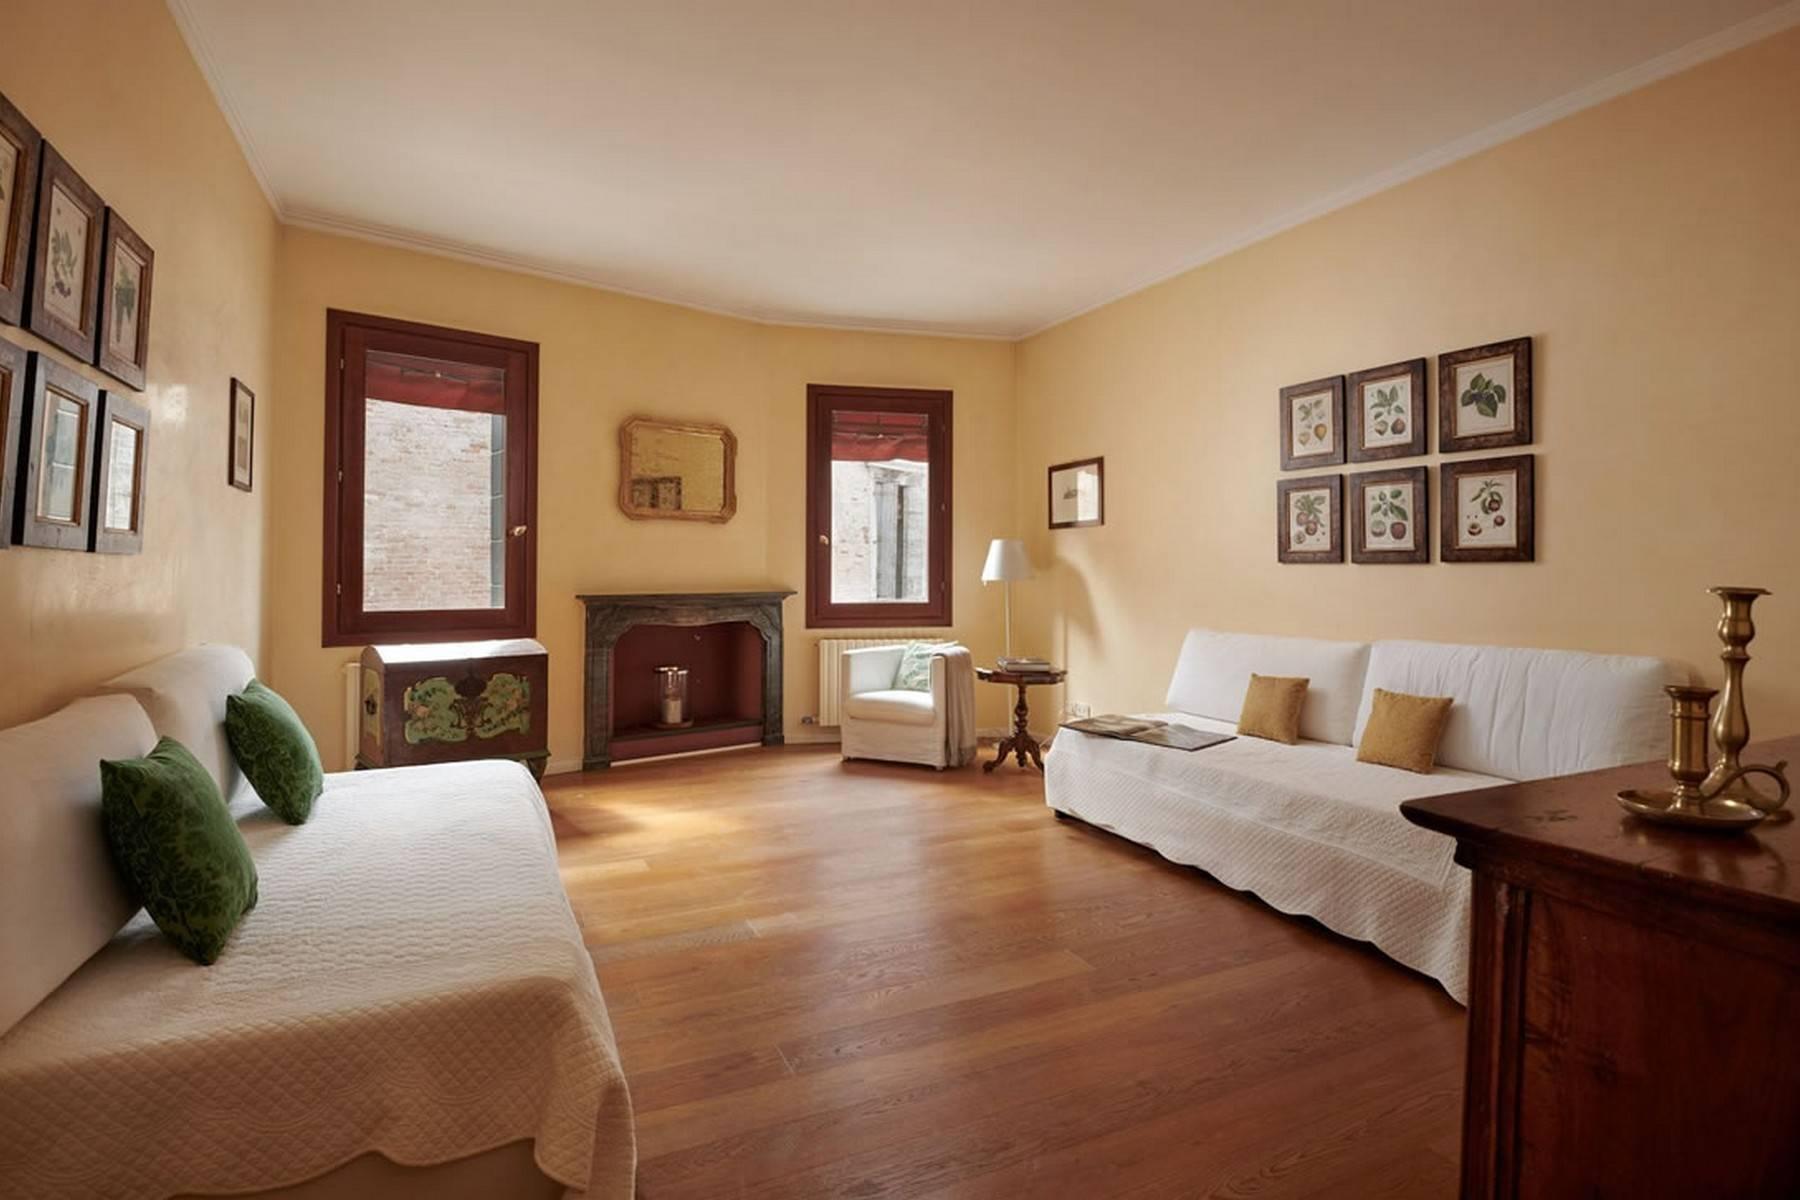 Appartement de design dans le Palazzo Querini Stampalia / S.M. Formosa - 22